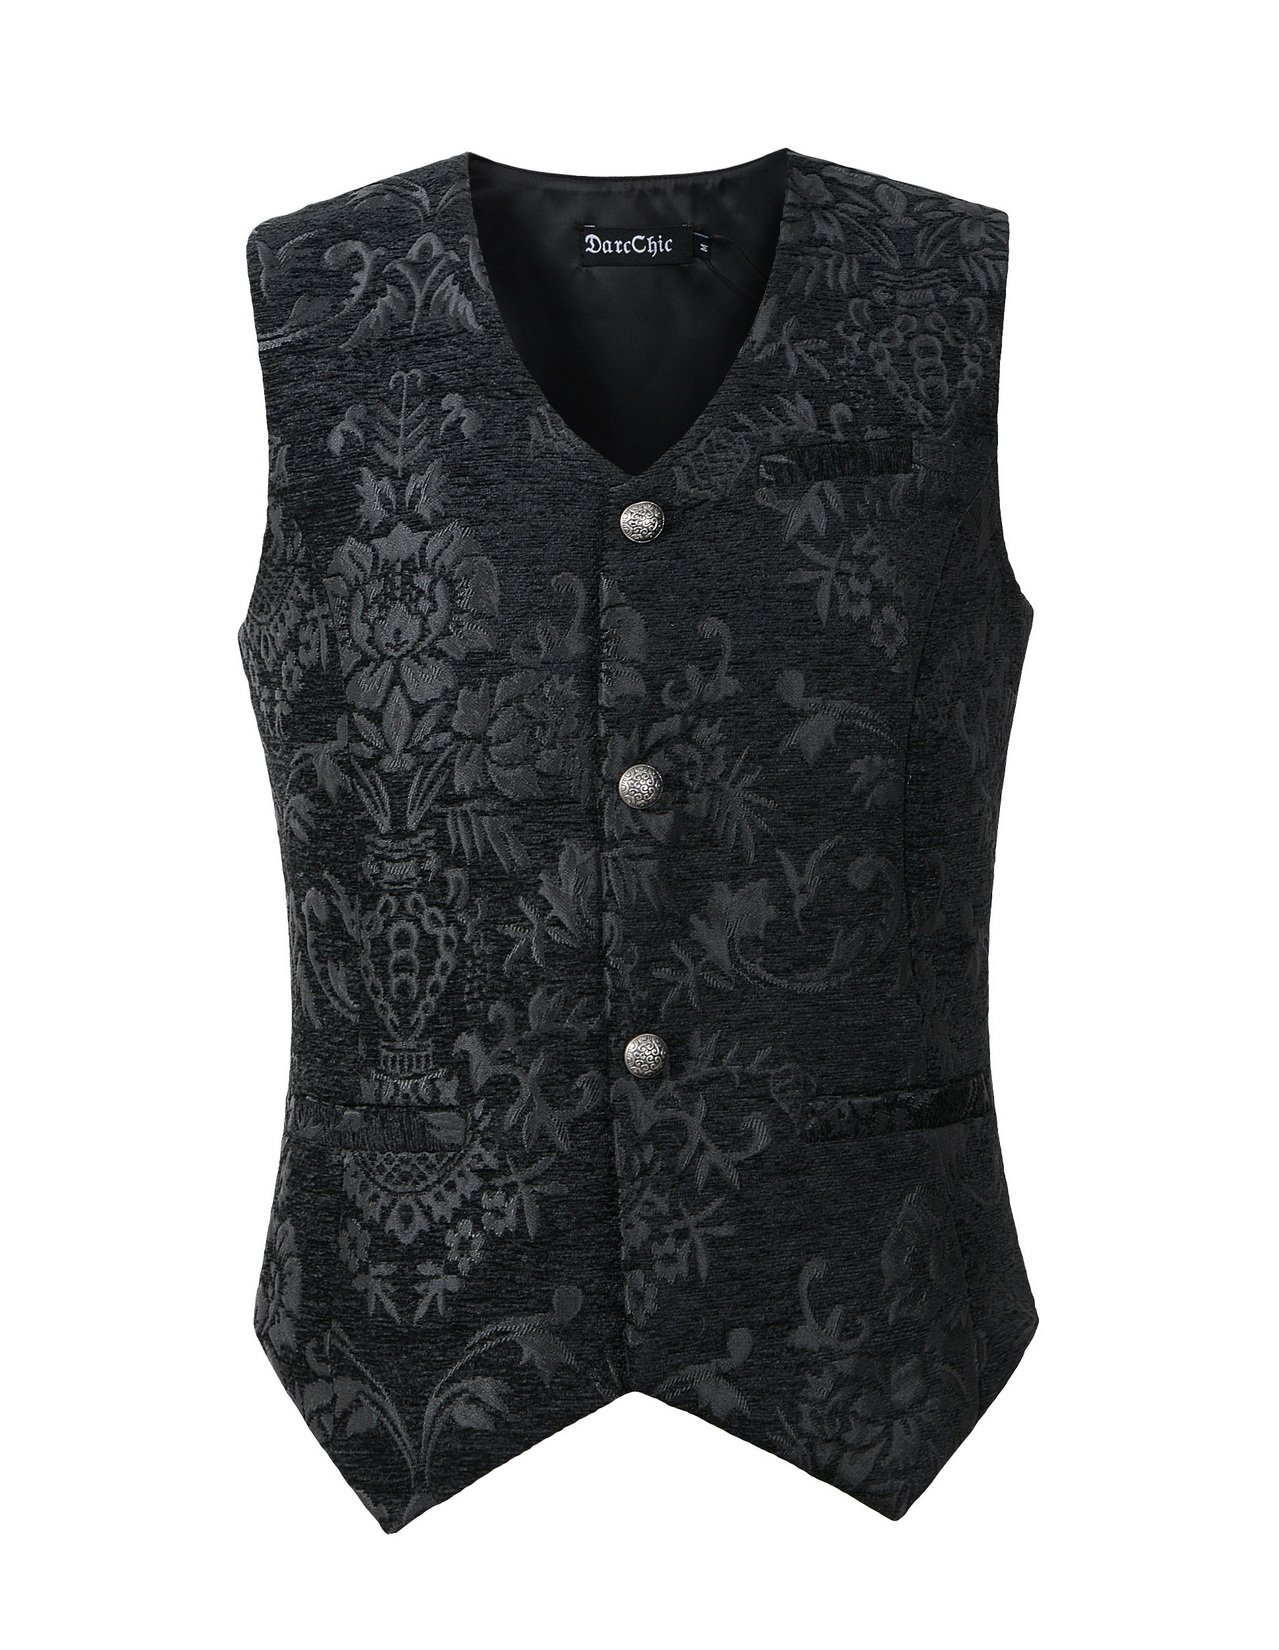 DarcChic Mens Vest Waistcoat Gothic Steampunk Victorian (M, Black Tapestry) by DarcChic